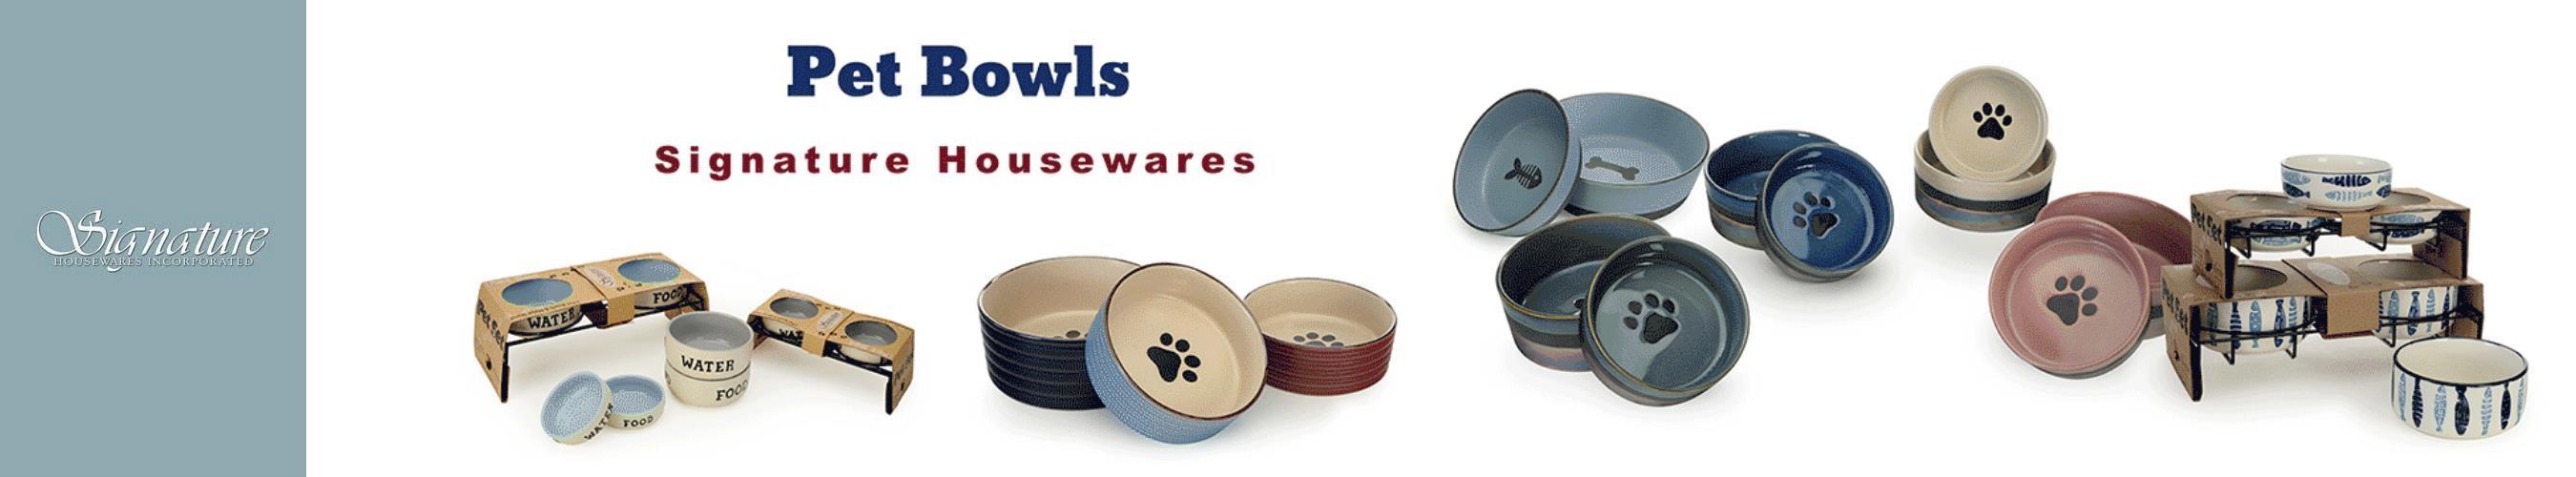 Signature Housewares, Inc.